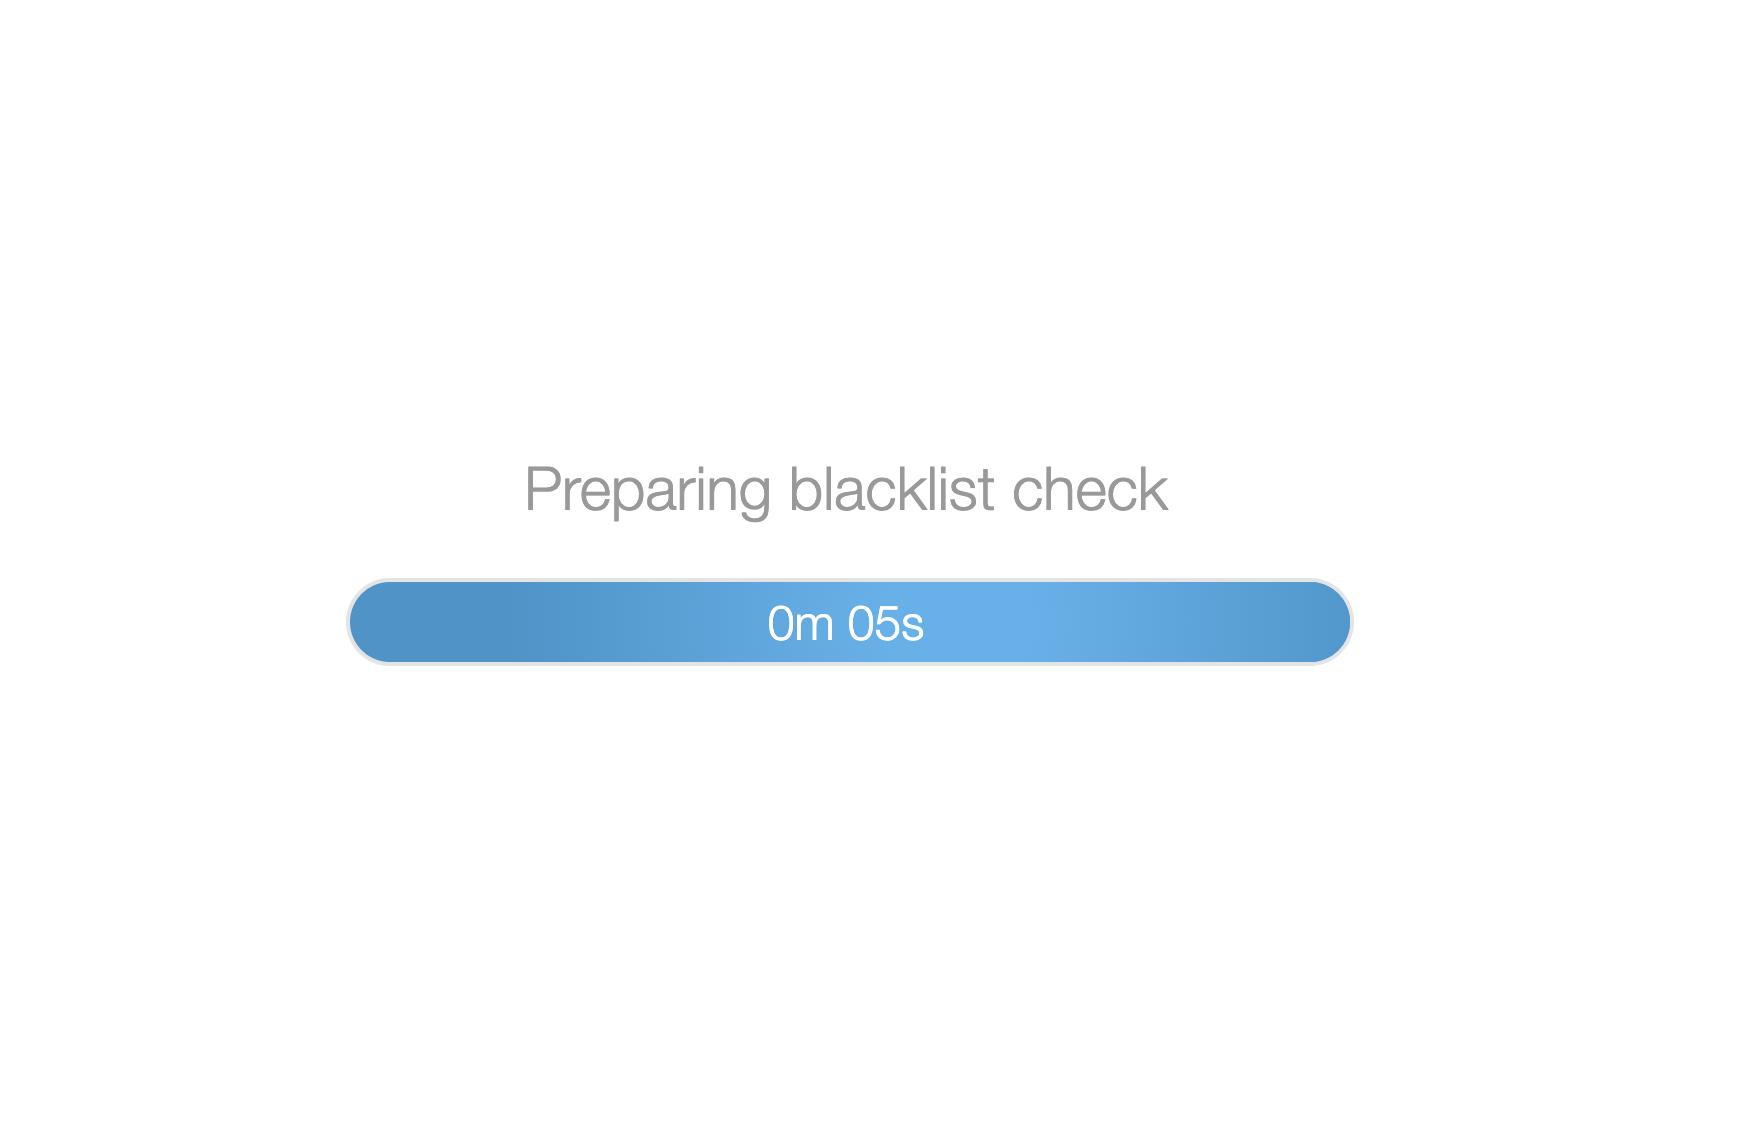 Blacklist check